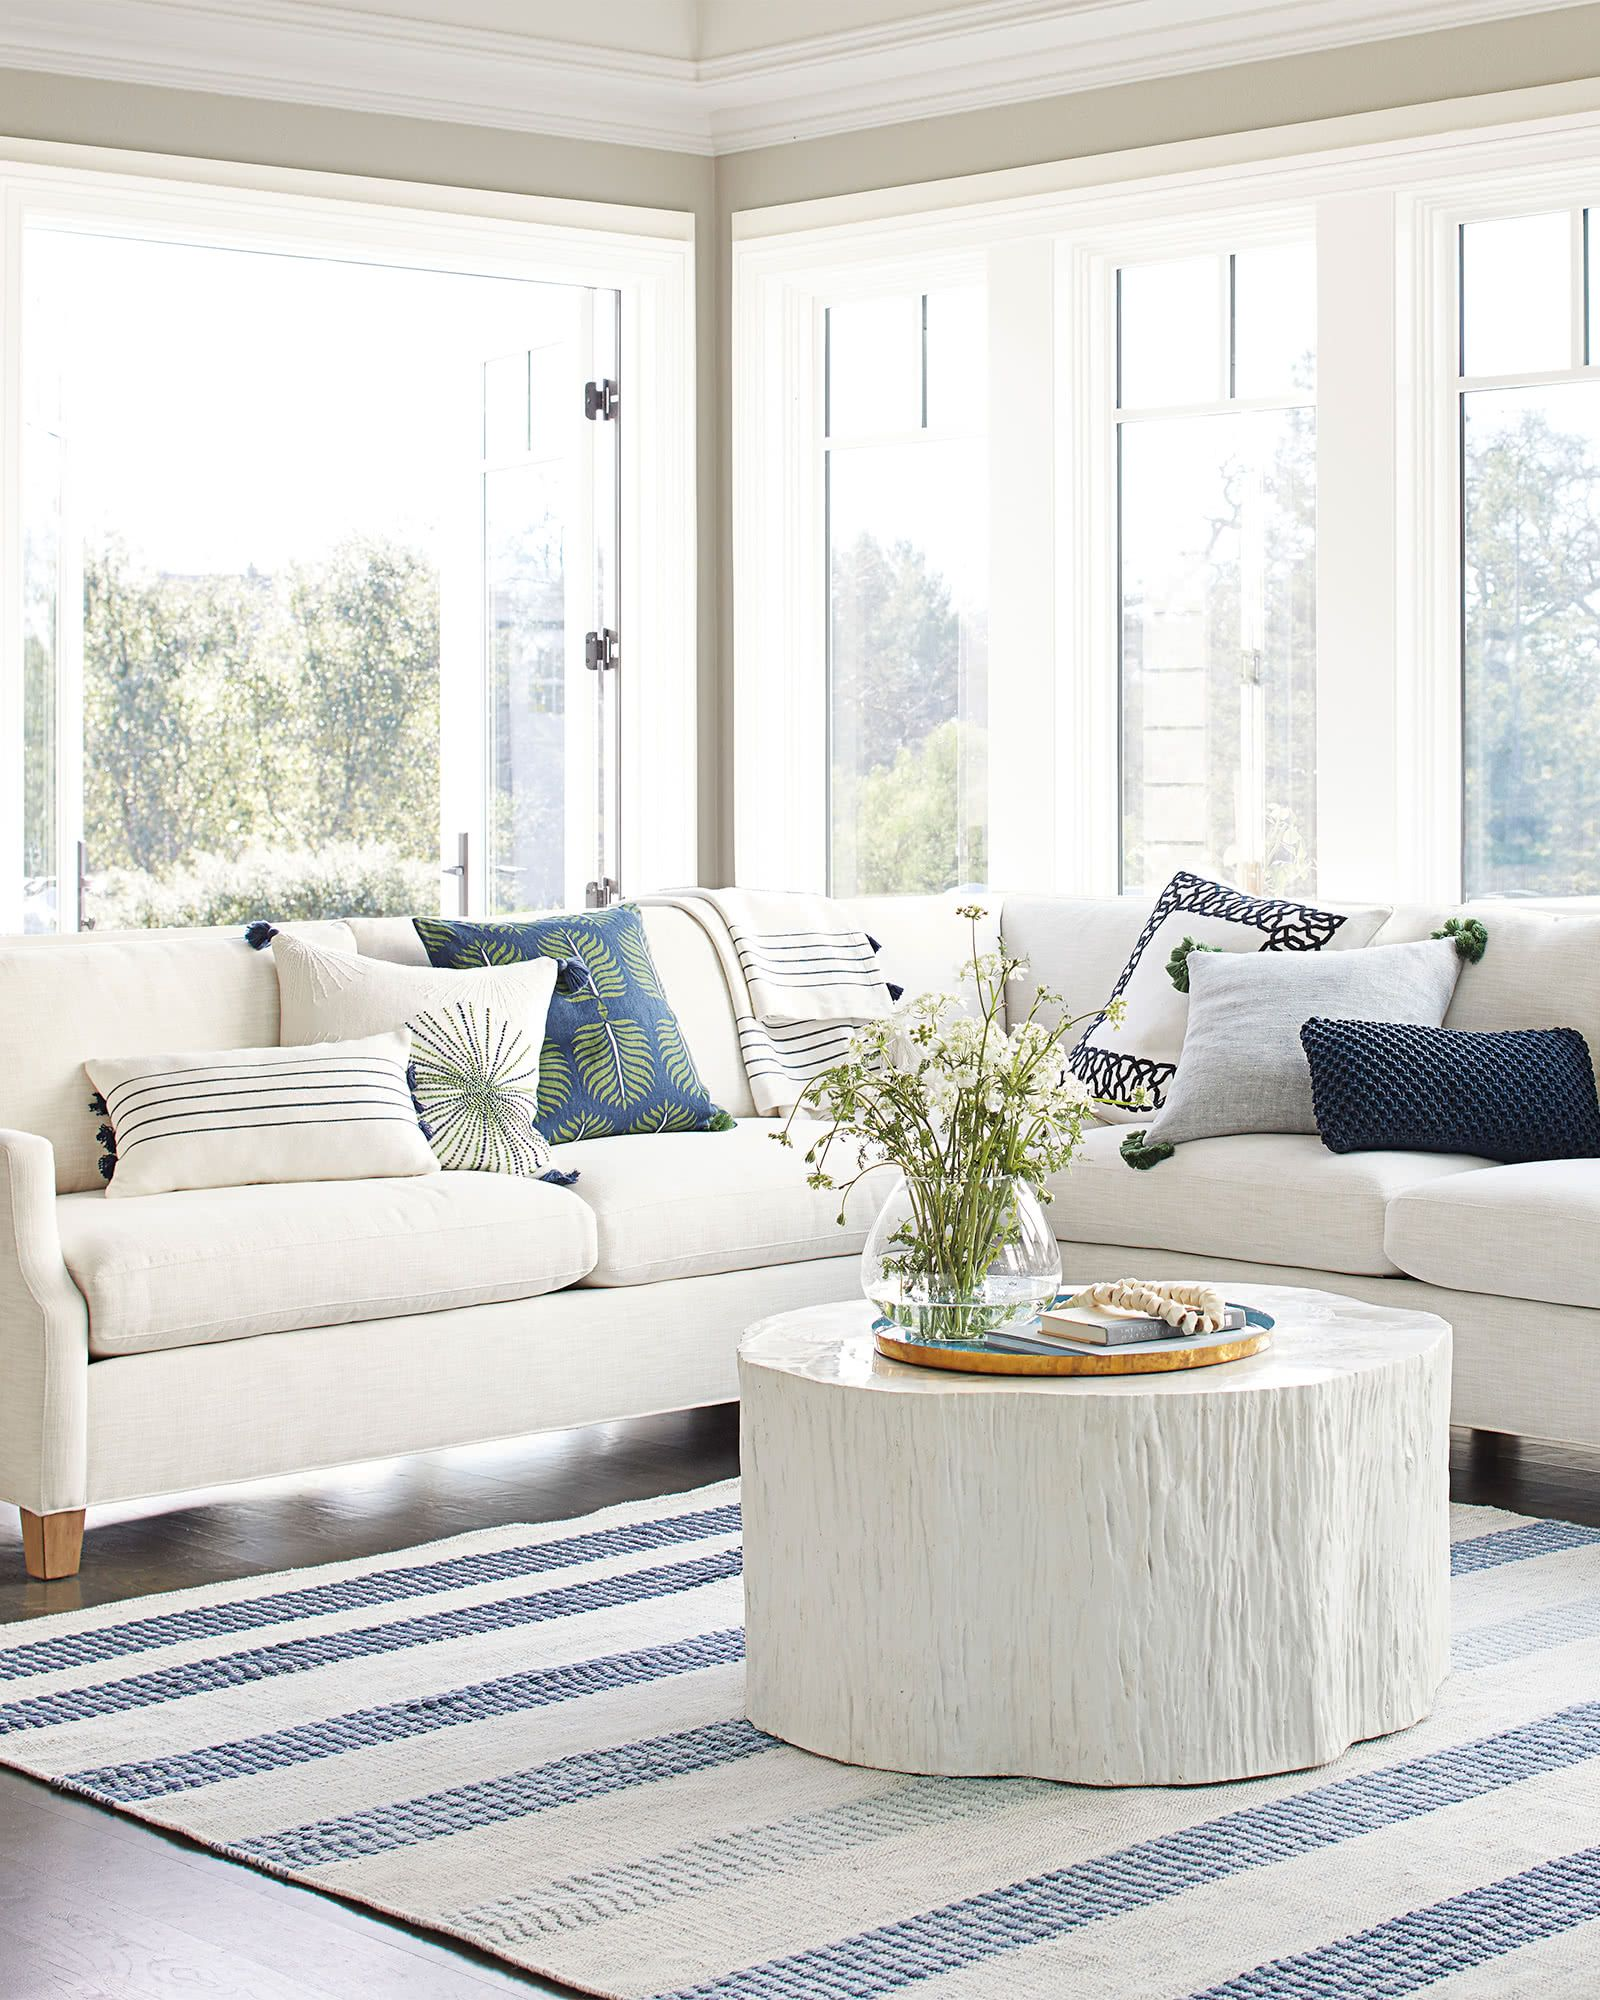 Truro Coffee Table Blue Decor Living Room Furniture Living Room Decor